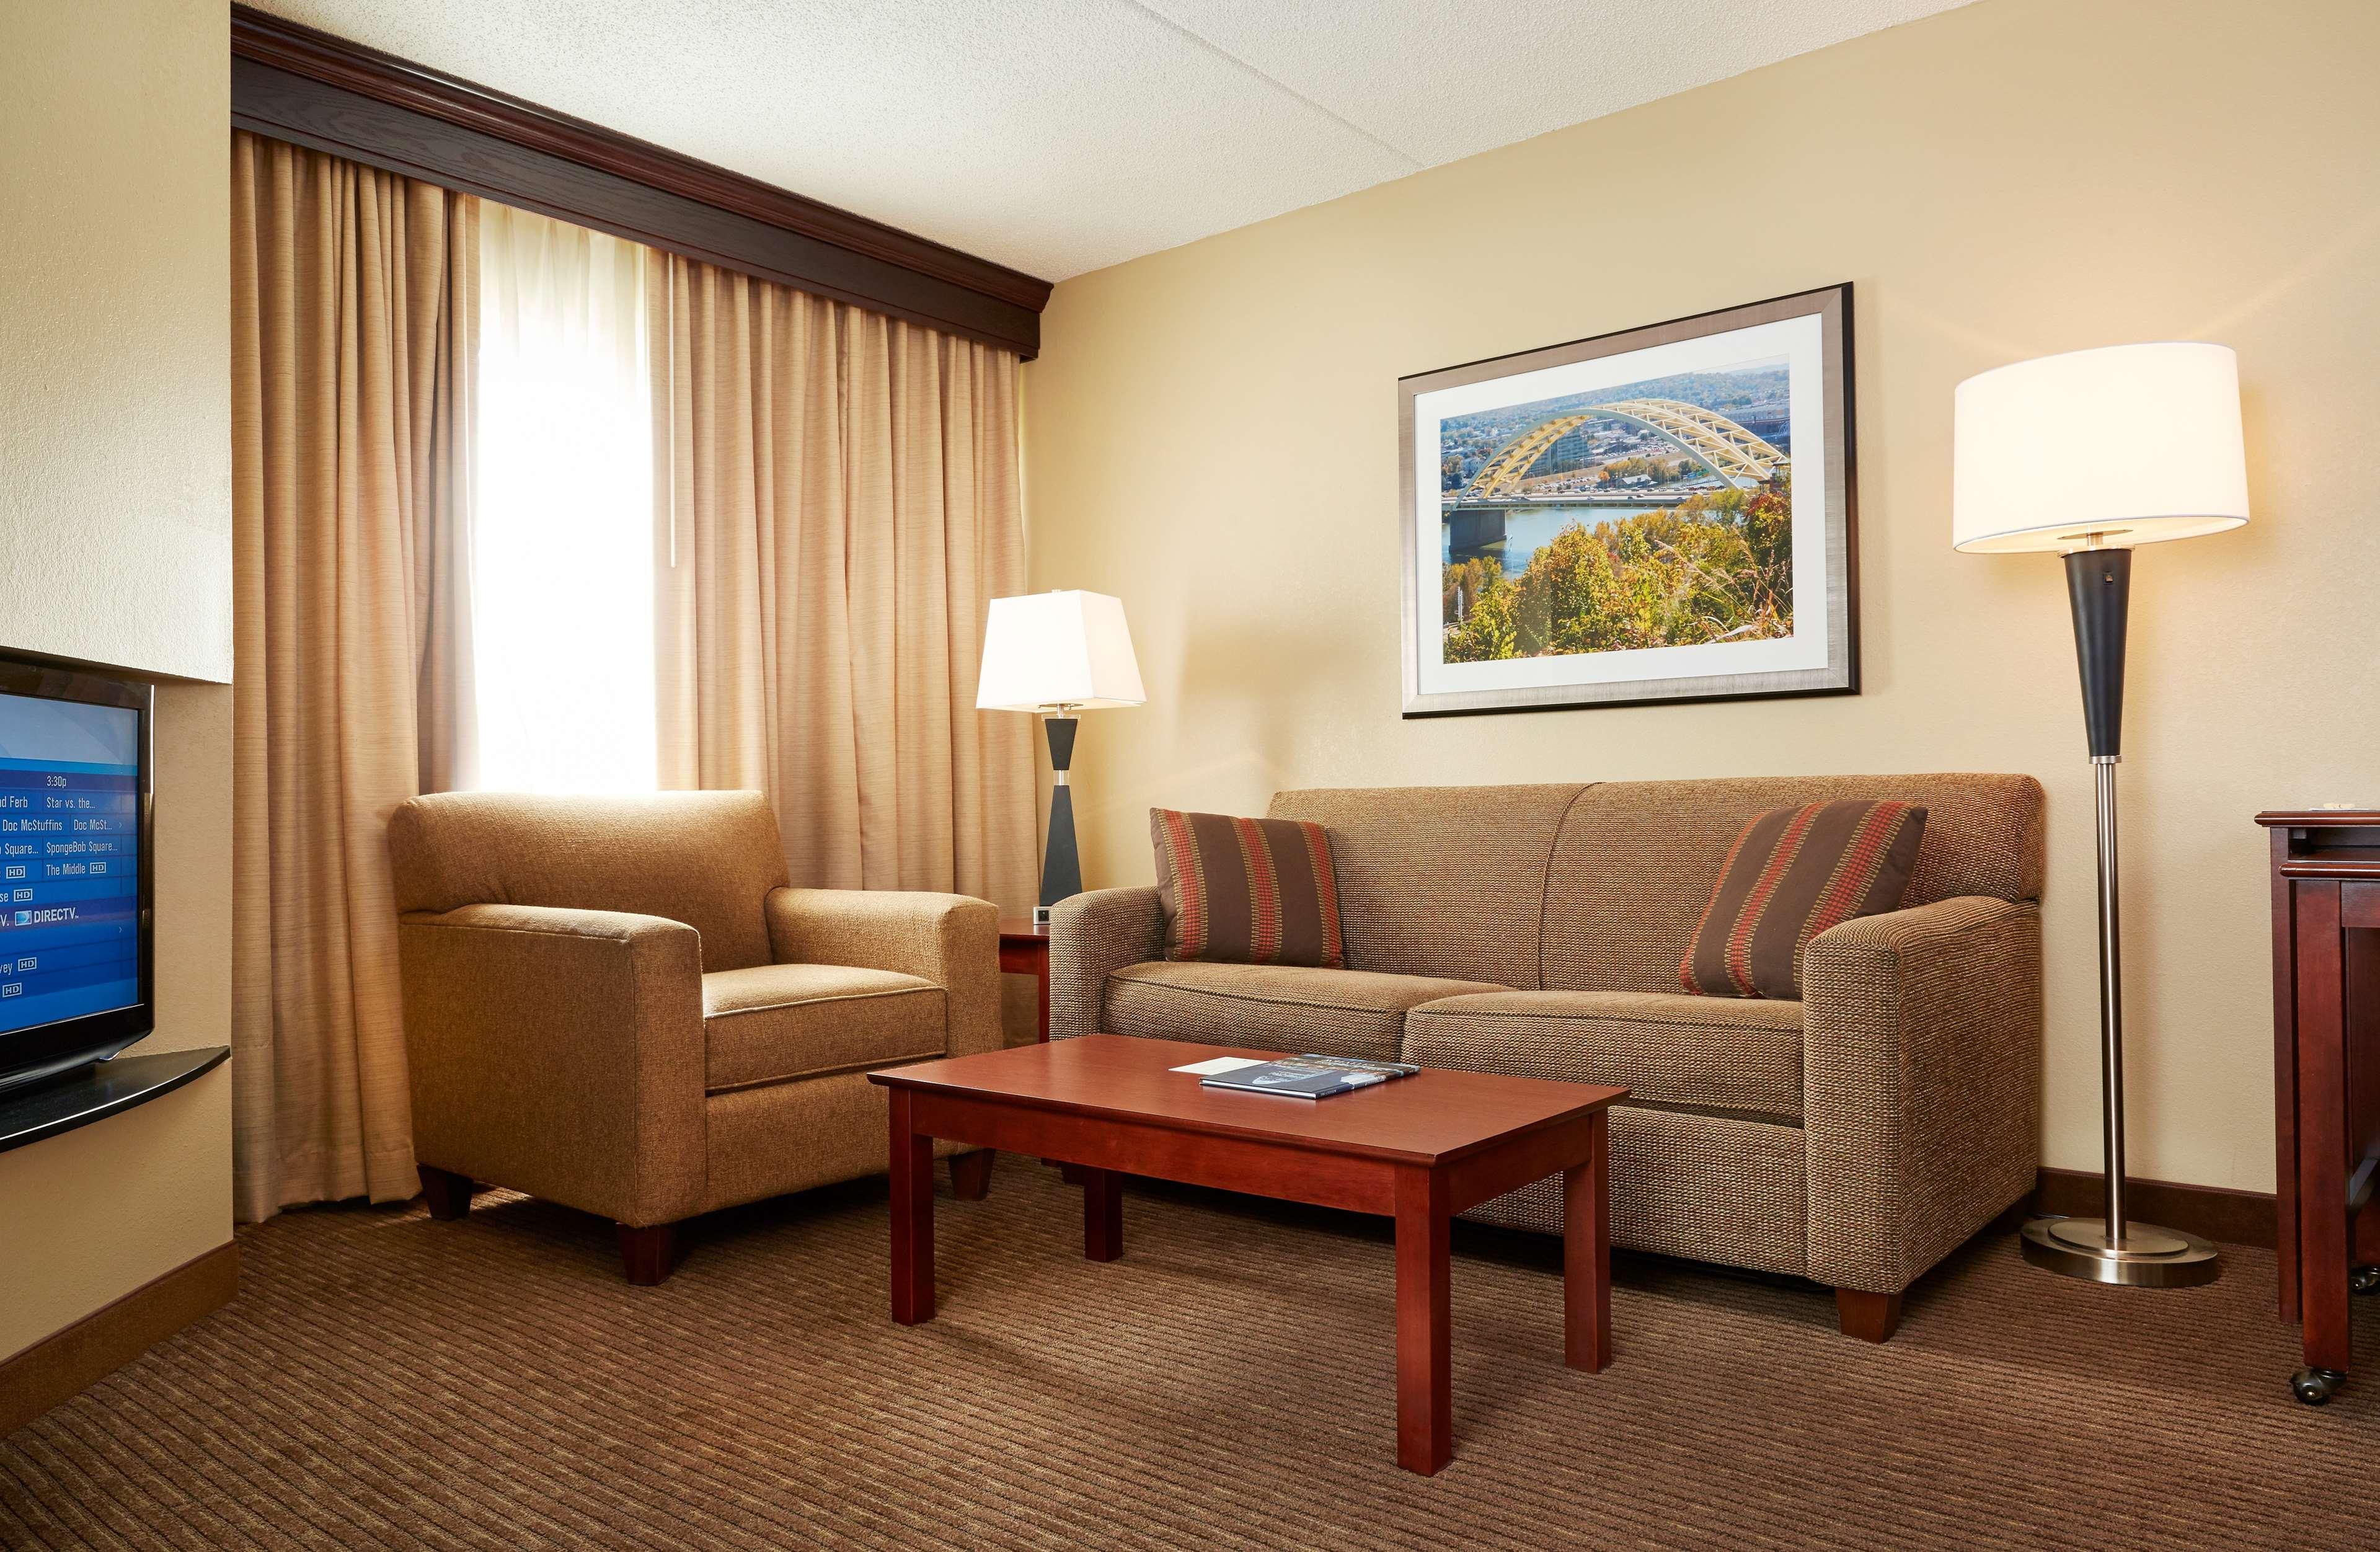 DoubleTree Suites by Hilton Hotel Cincinnati - Blue Ash image 19